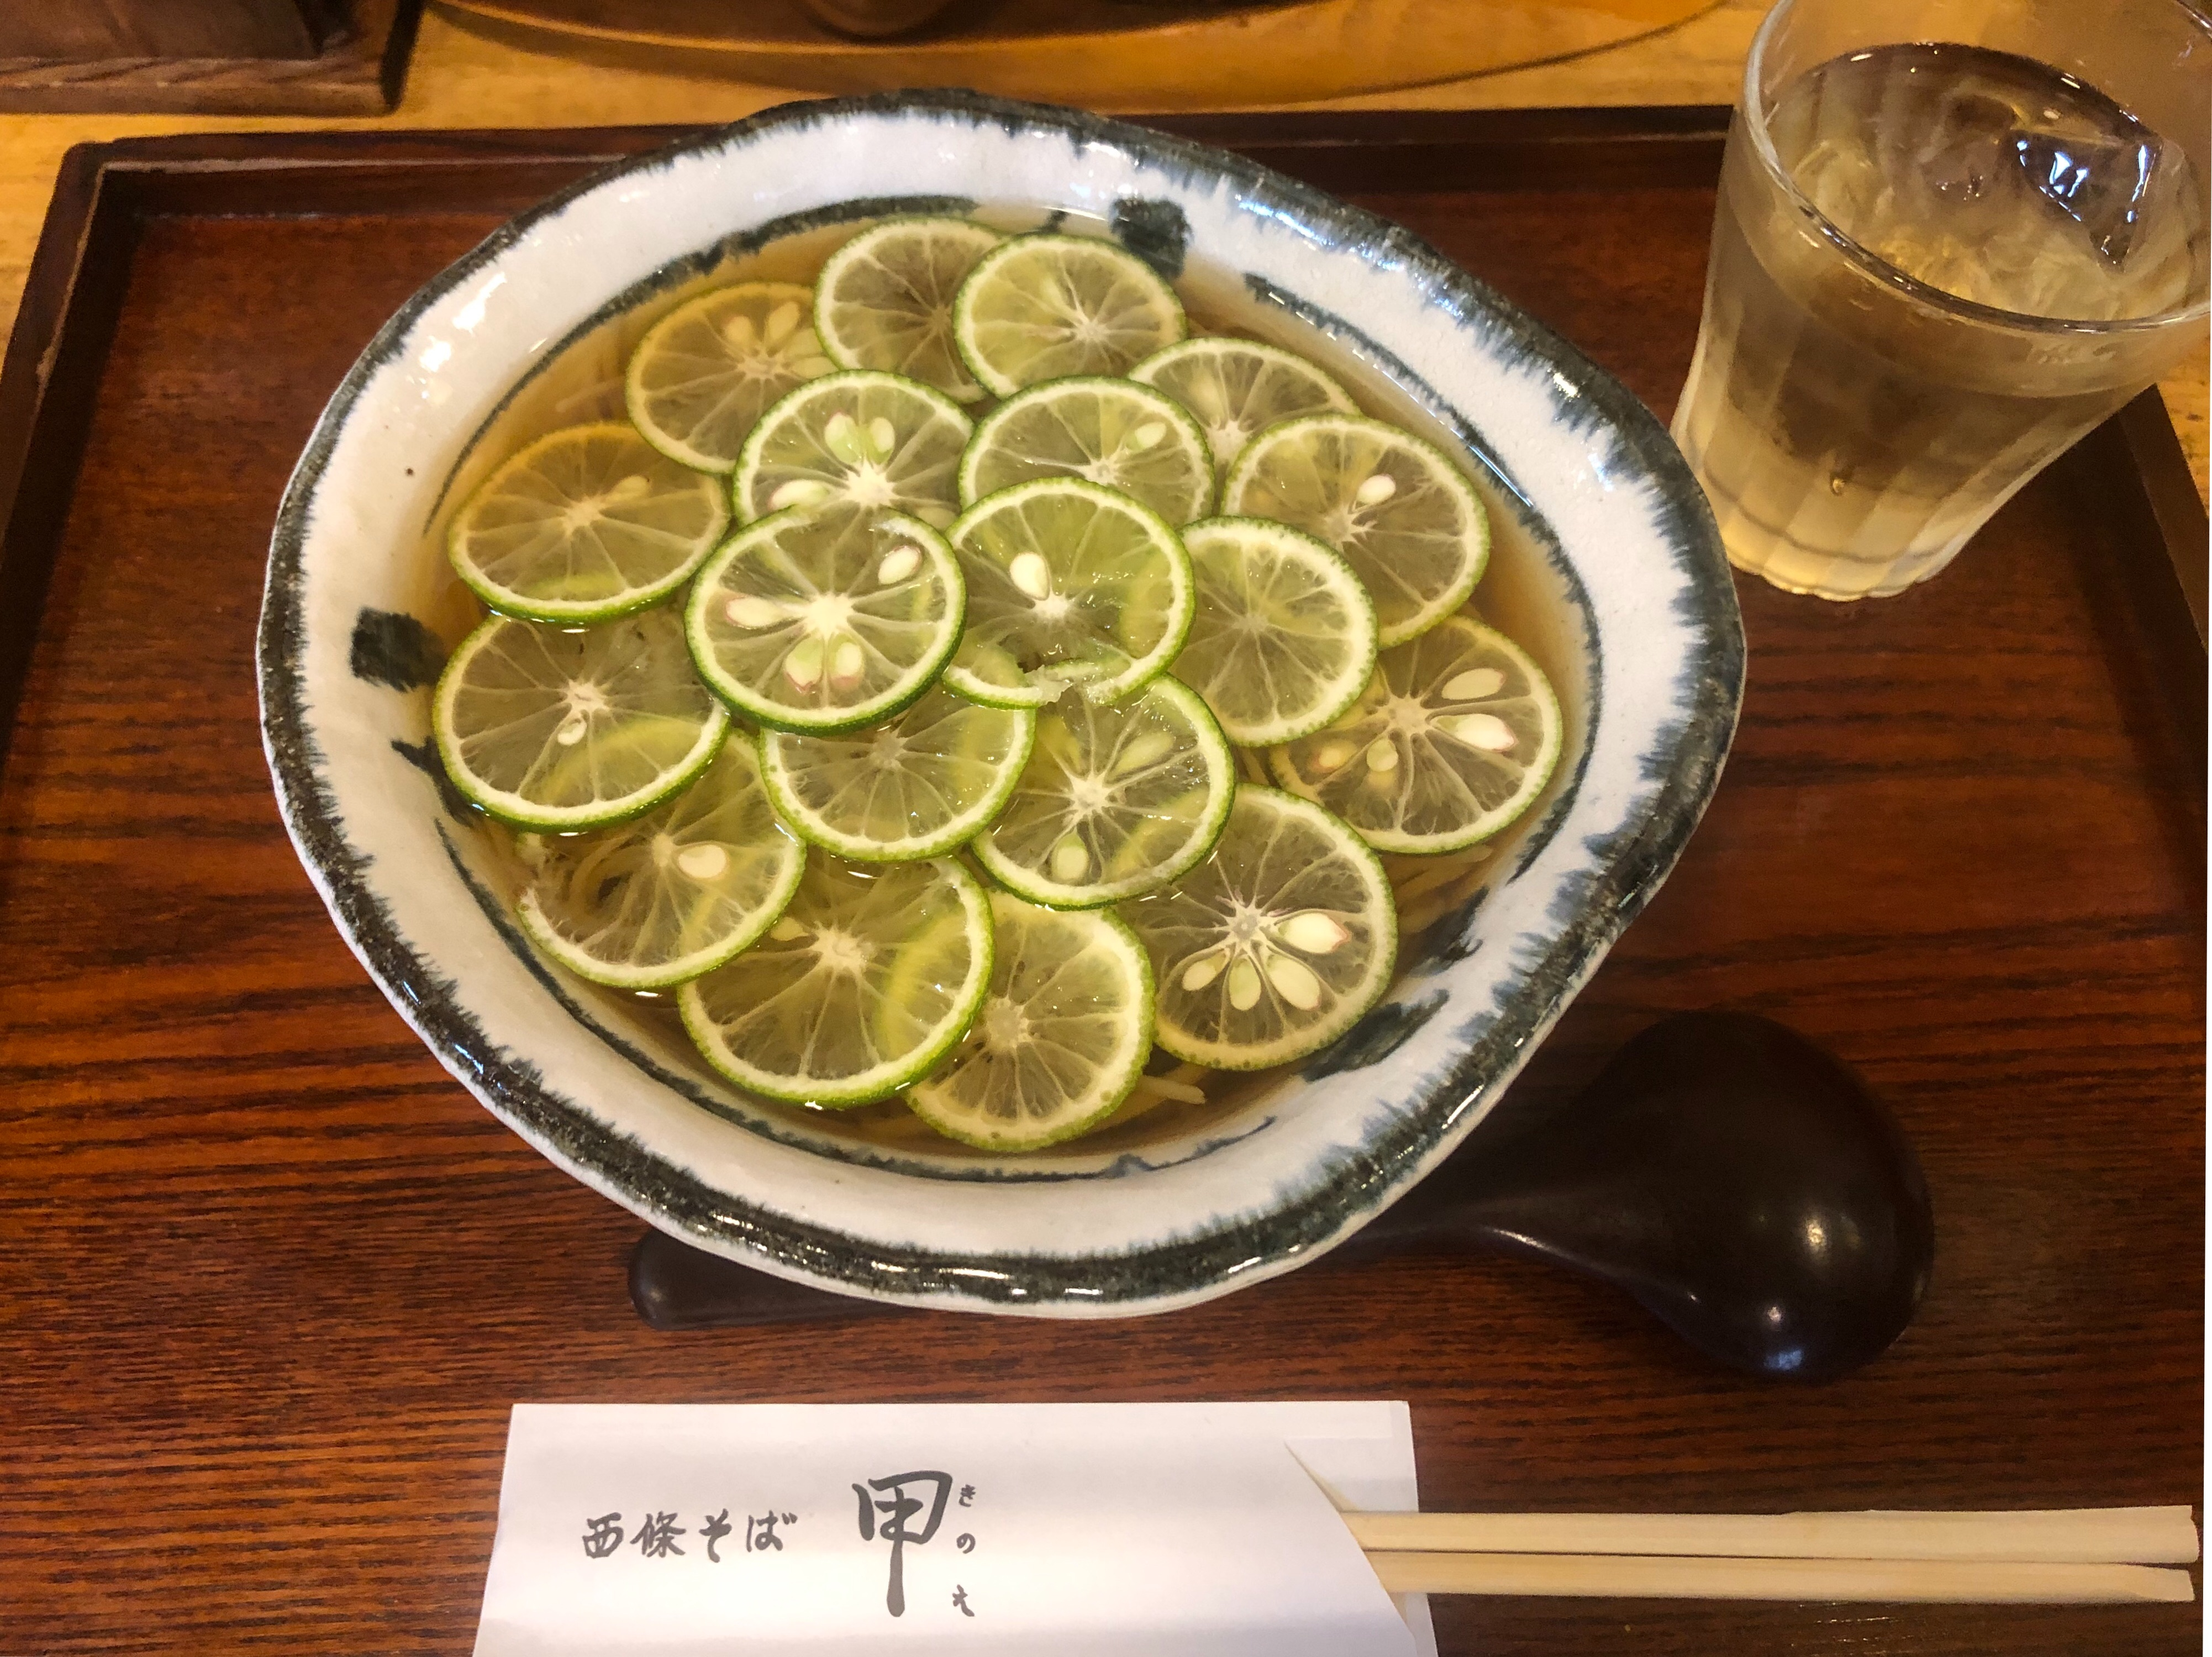 f:id:masanori-kato1972:20190713185004j:image